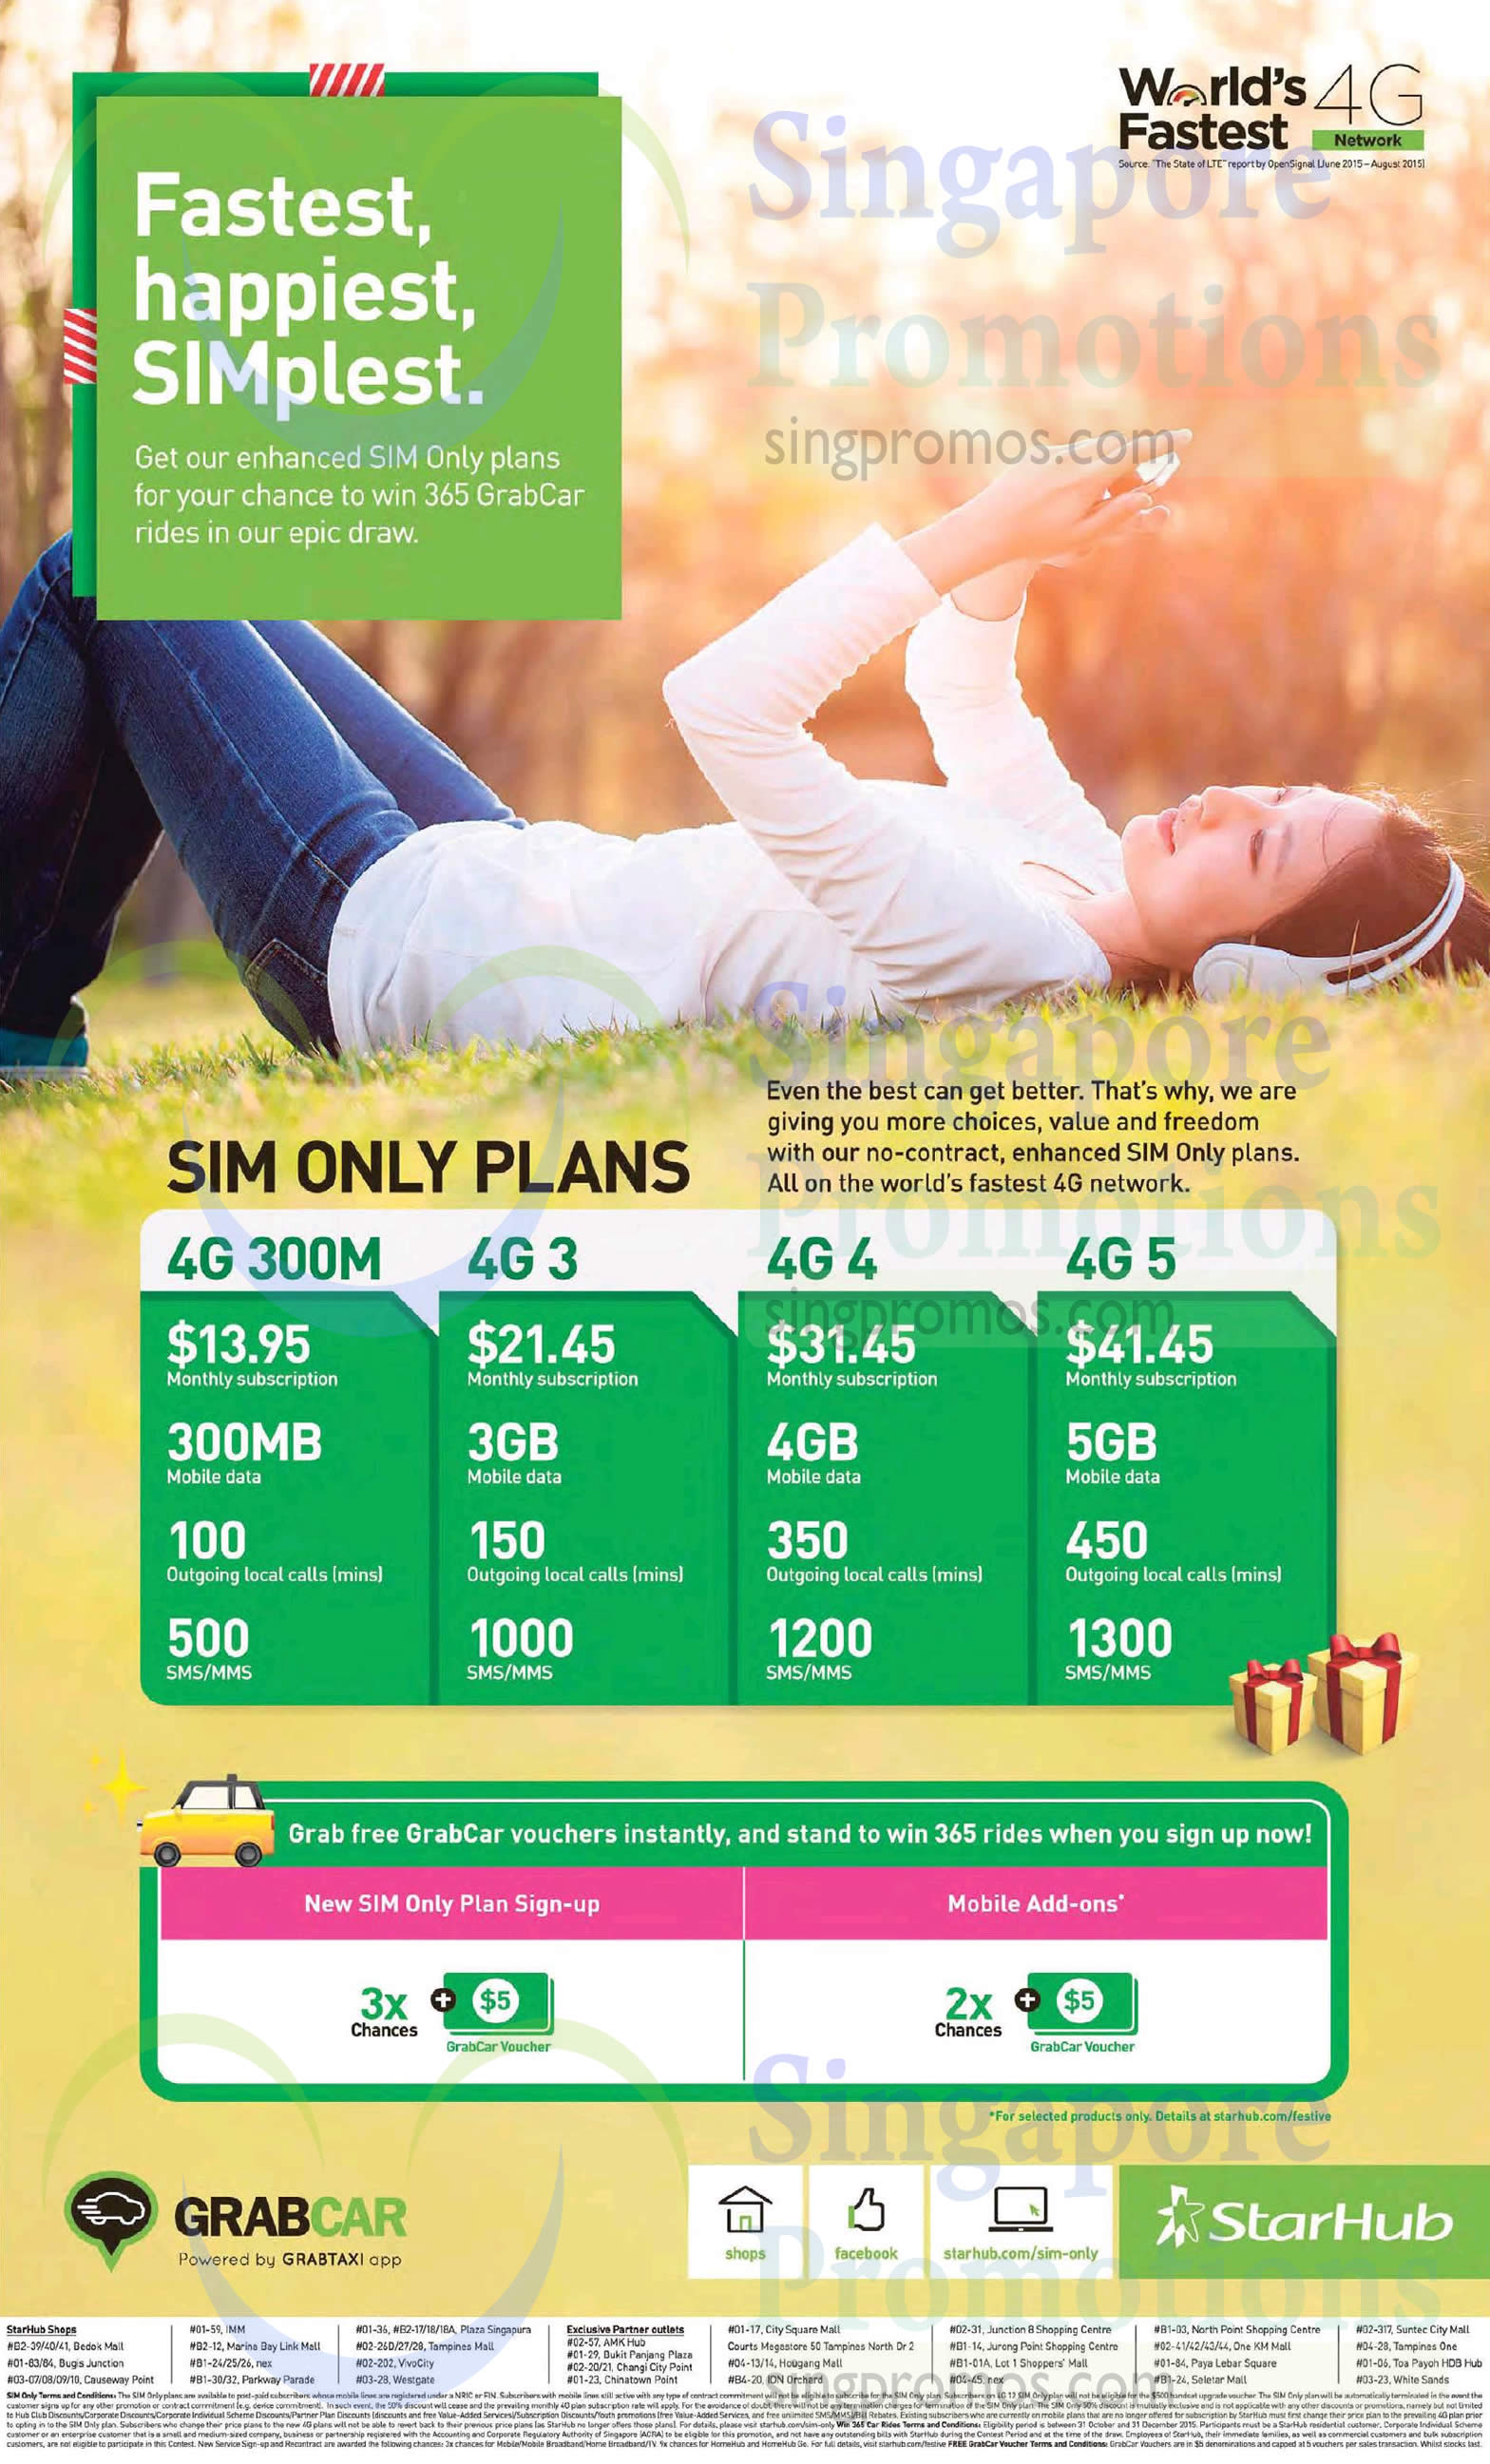 Sim Only Plans fr 13.95 4G 300M, 4G 3, 4G 4, 4G 5